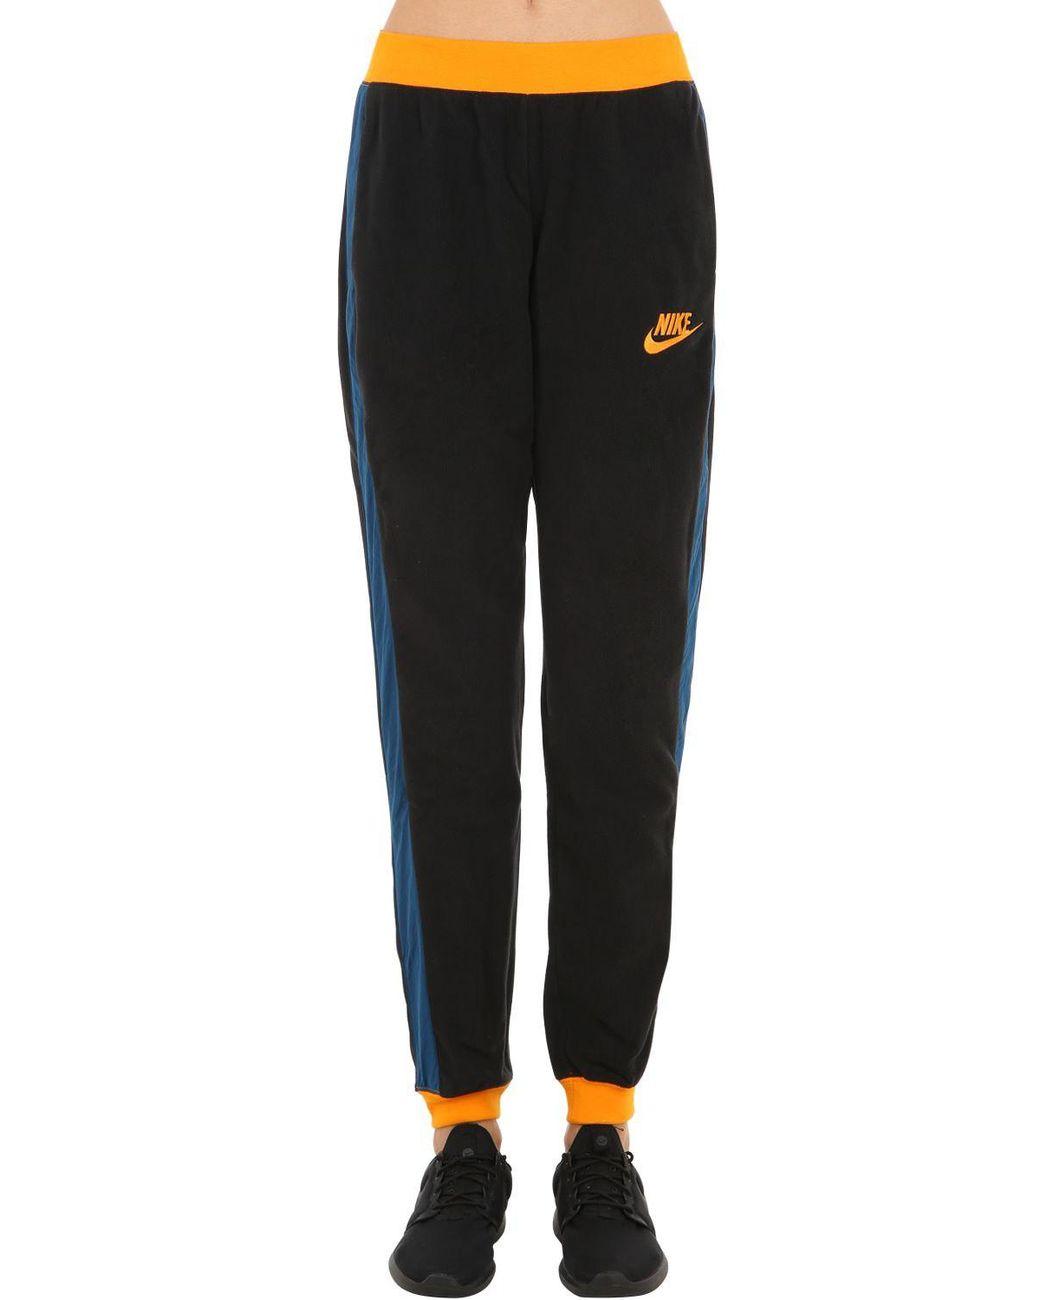 c80c29dcc8d8 Lyst - Nike Nsw Pant Polar Fleece Sweatpants in Black